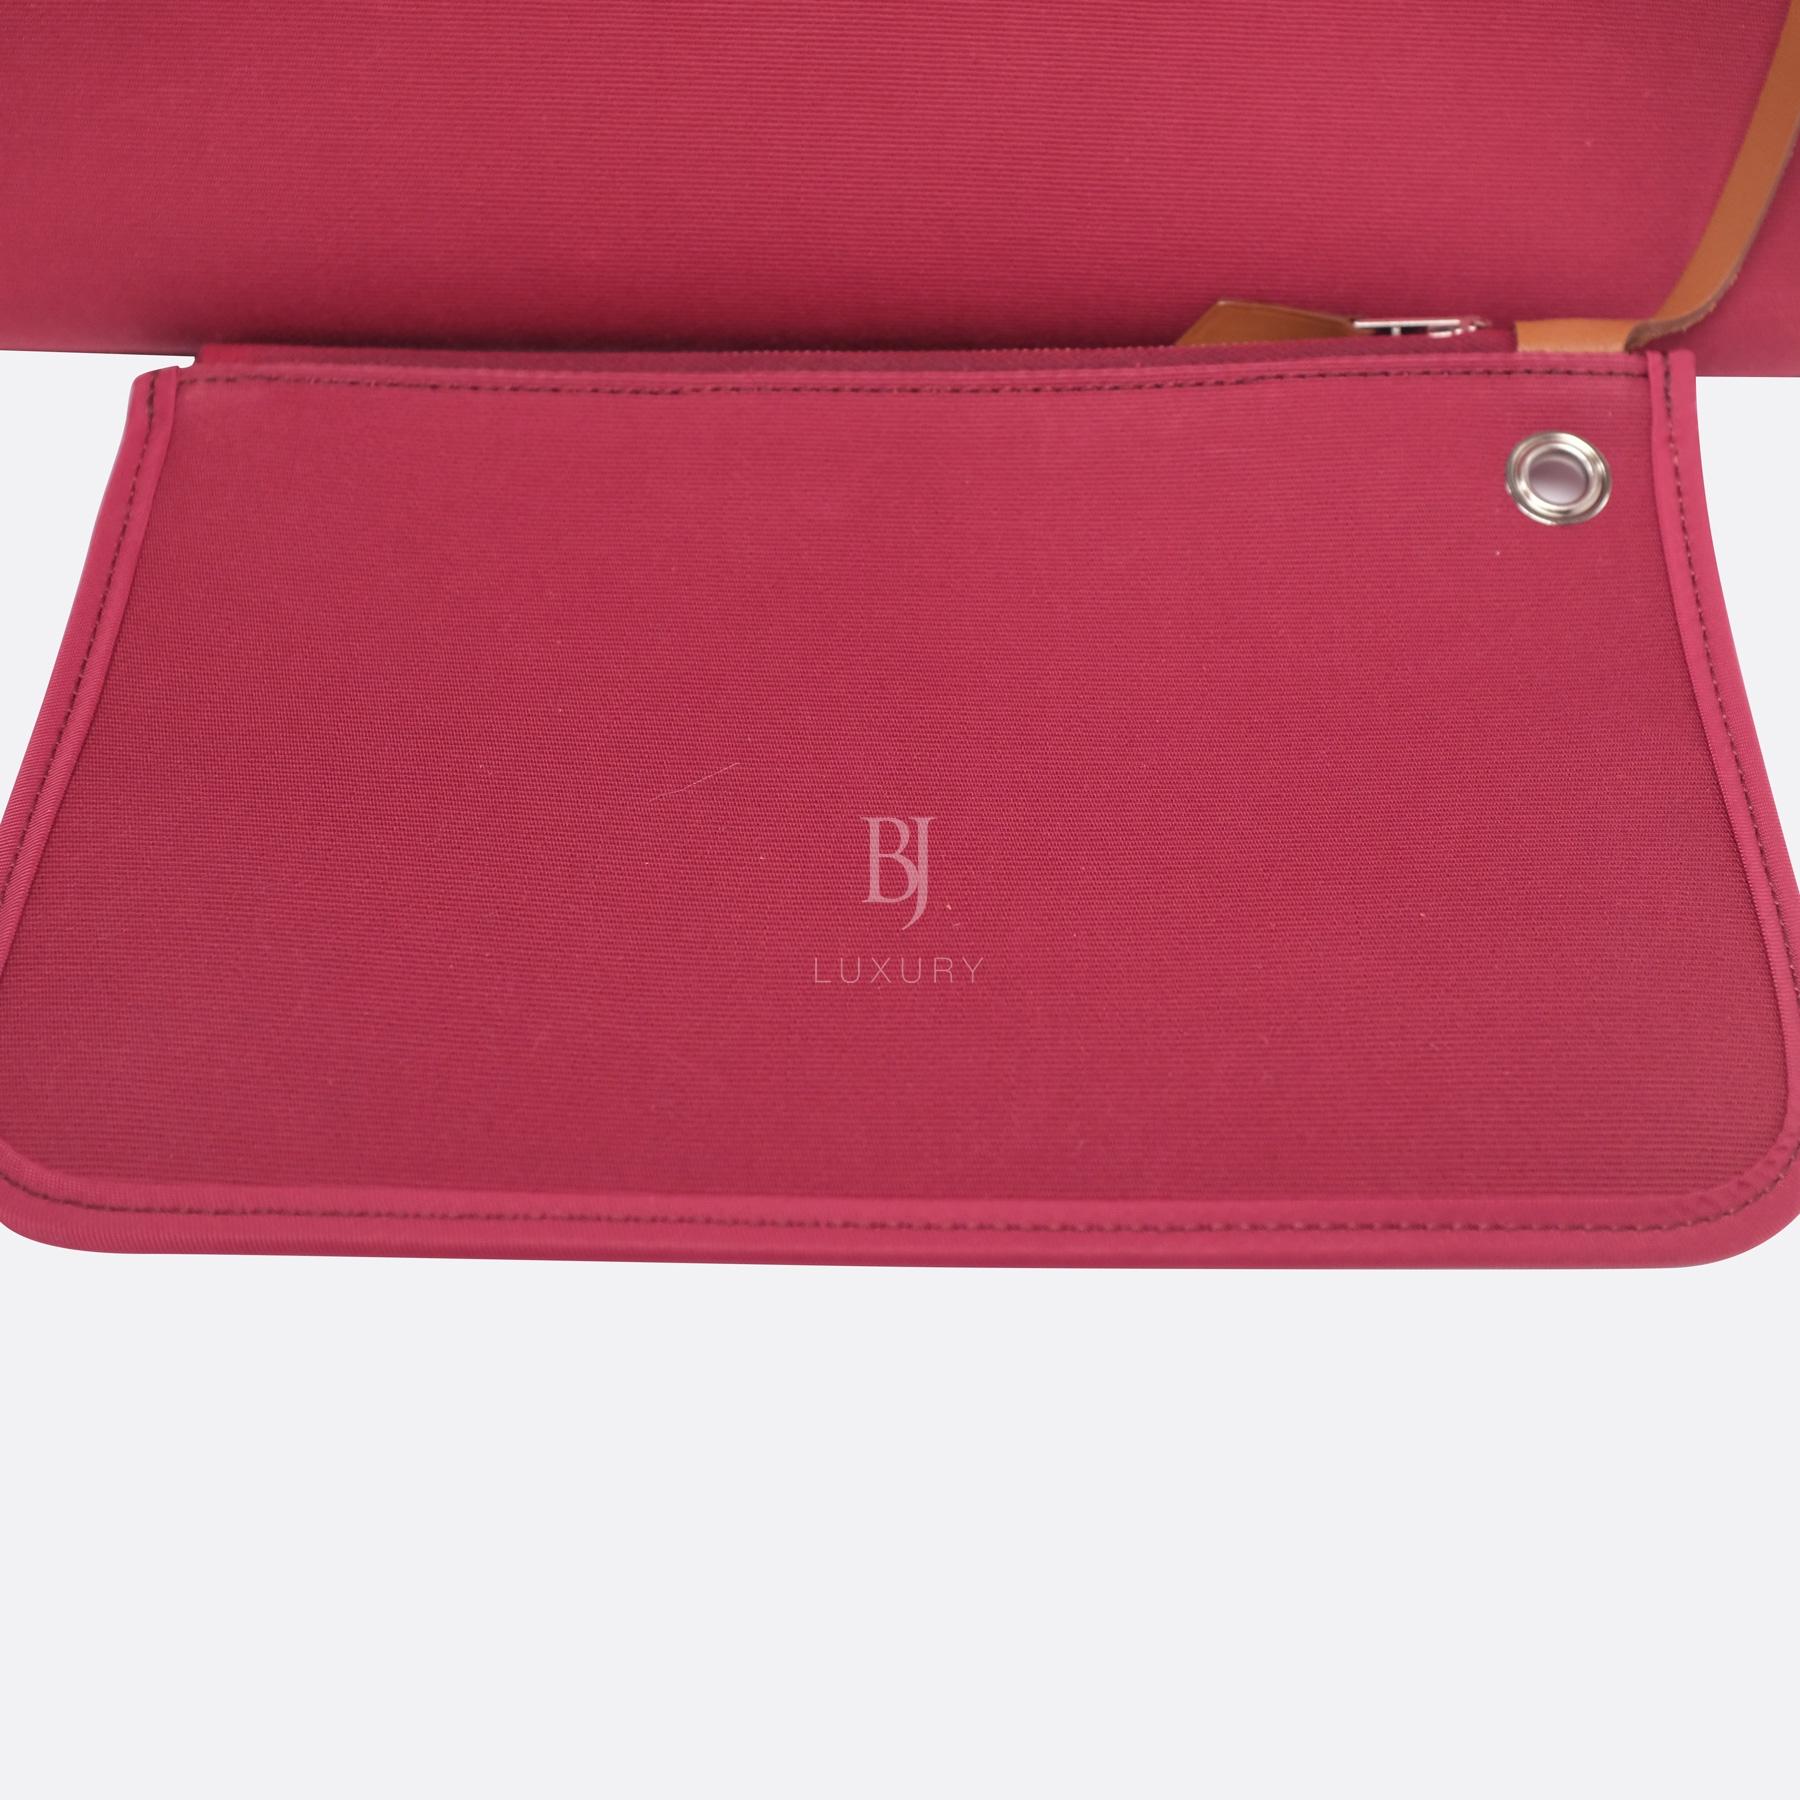 Hermes Herbag 31 Rubis Canvas Vache Palladium BJ Luxury 18.jpg